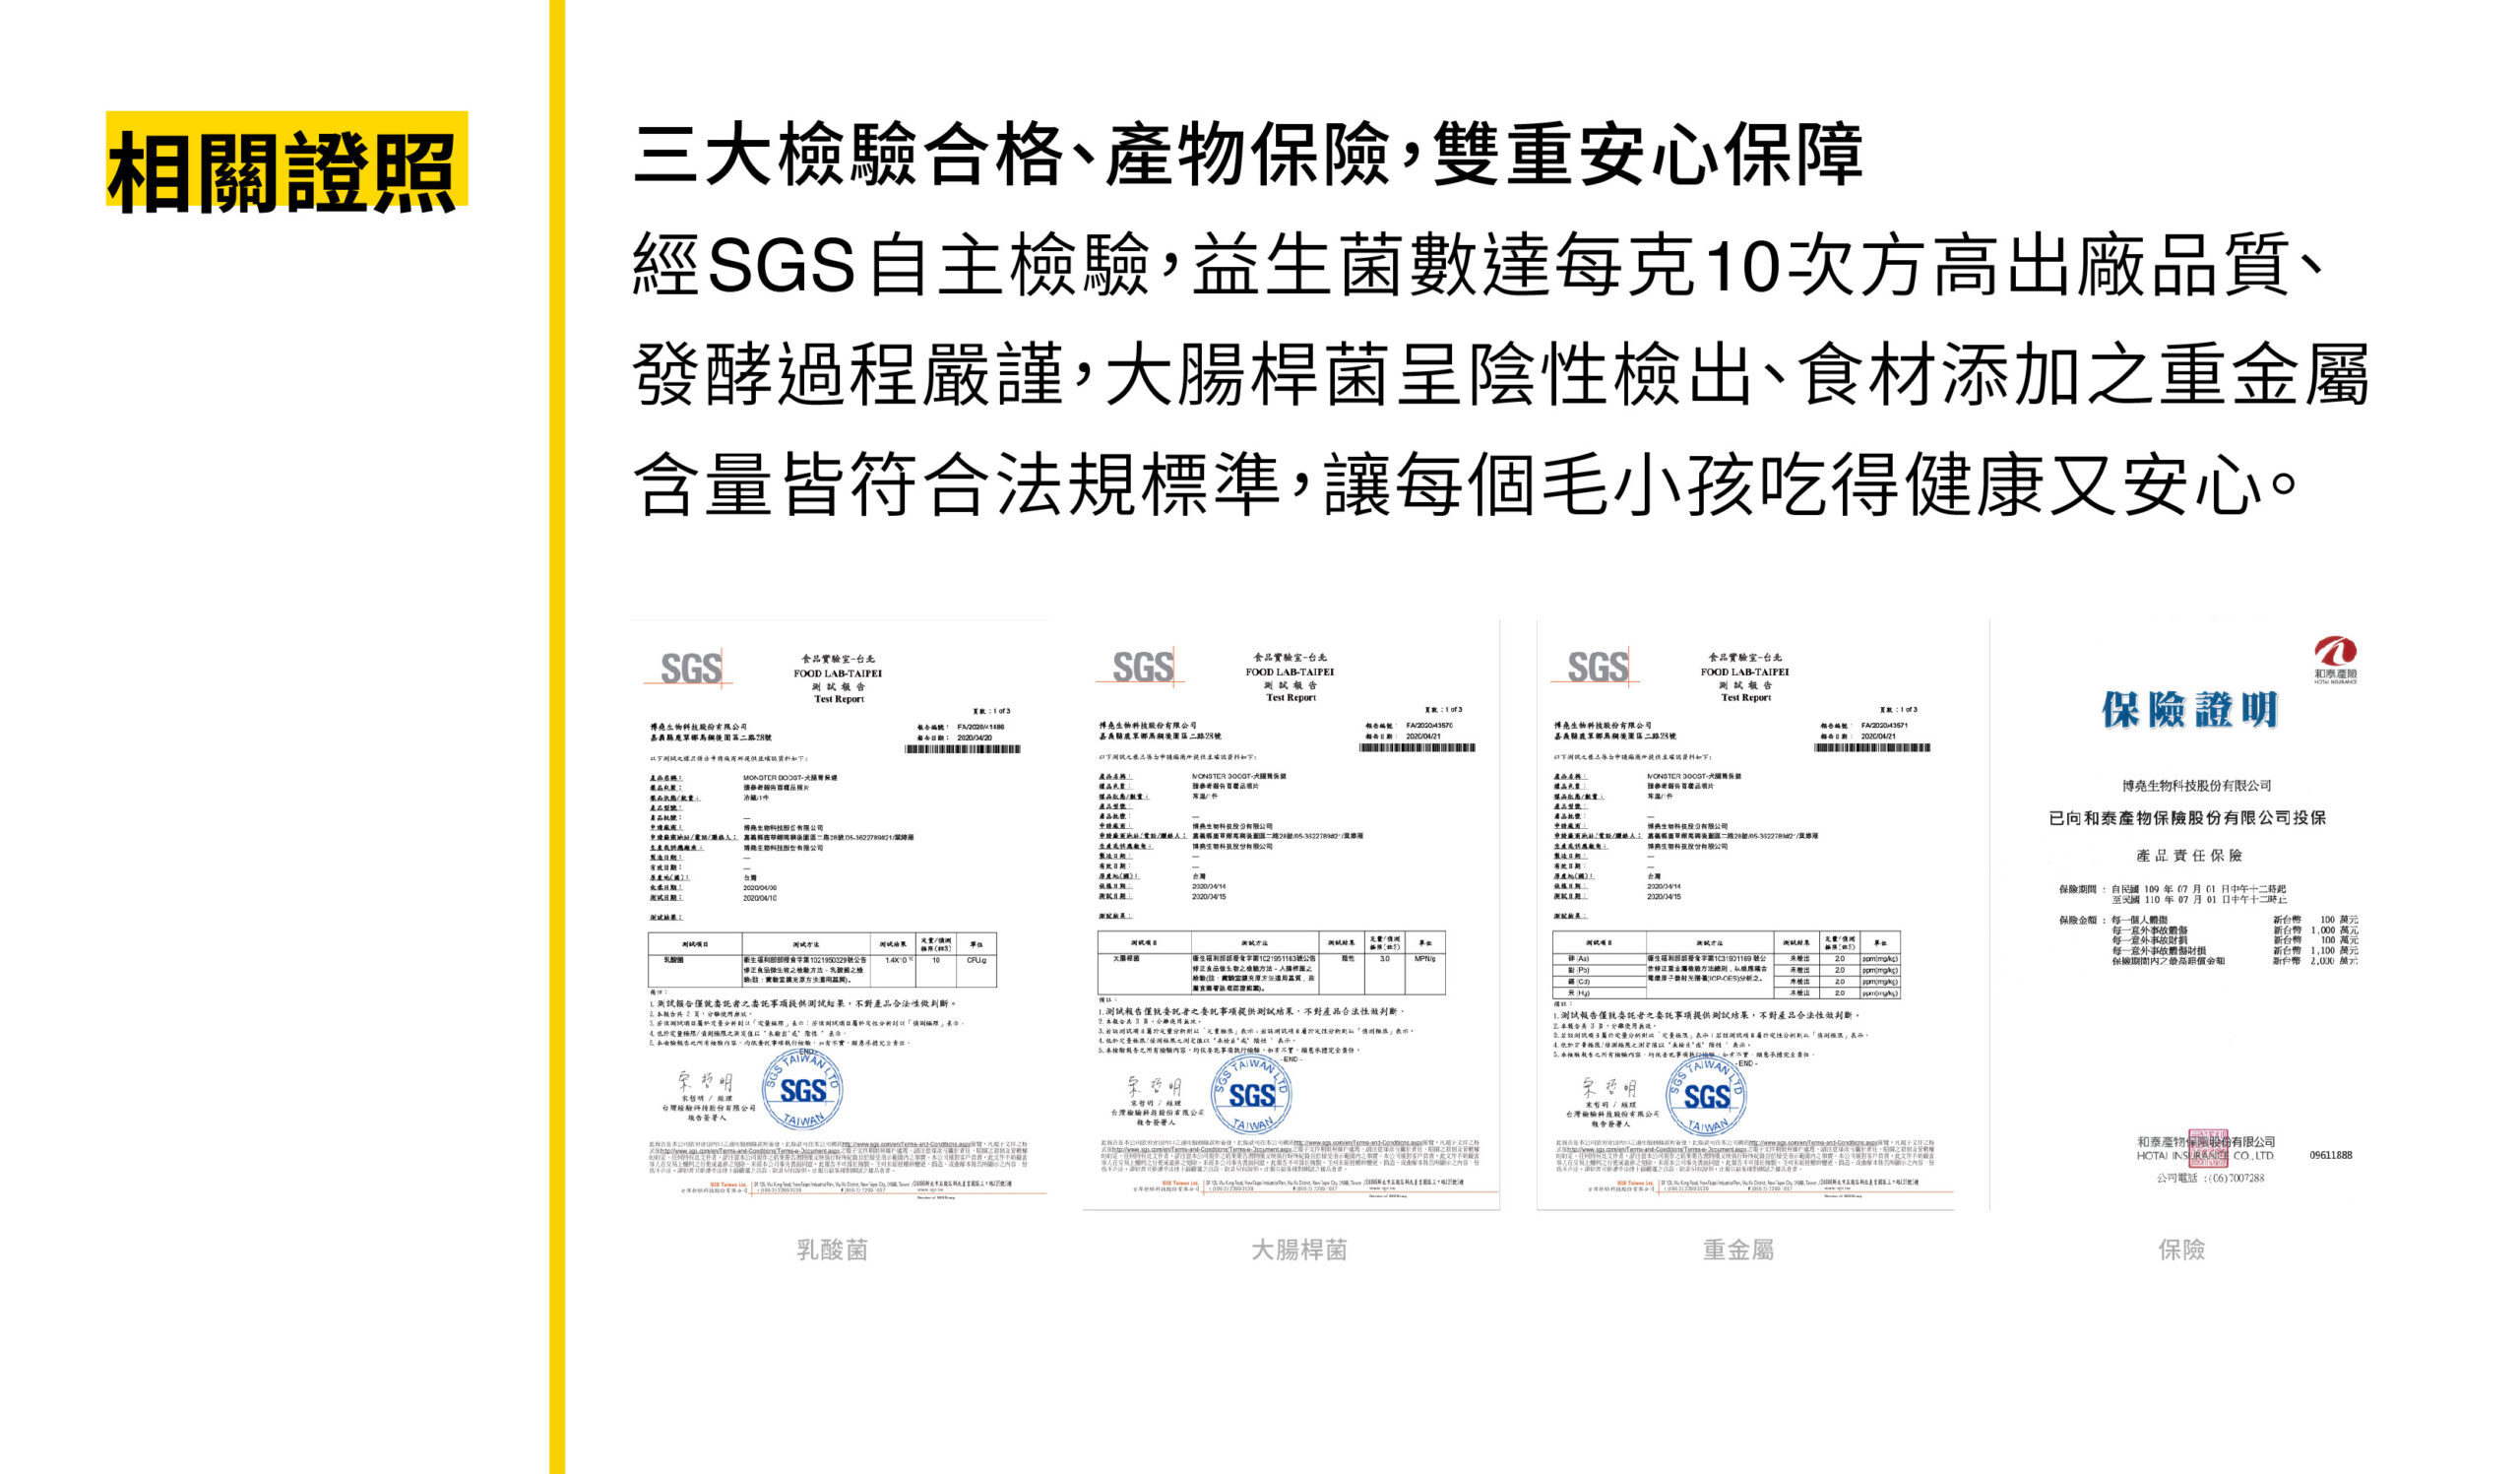 SGS檢驗、產物保險、菌數、出廠品質、大腸桿菌、重金屬